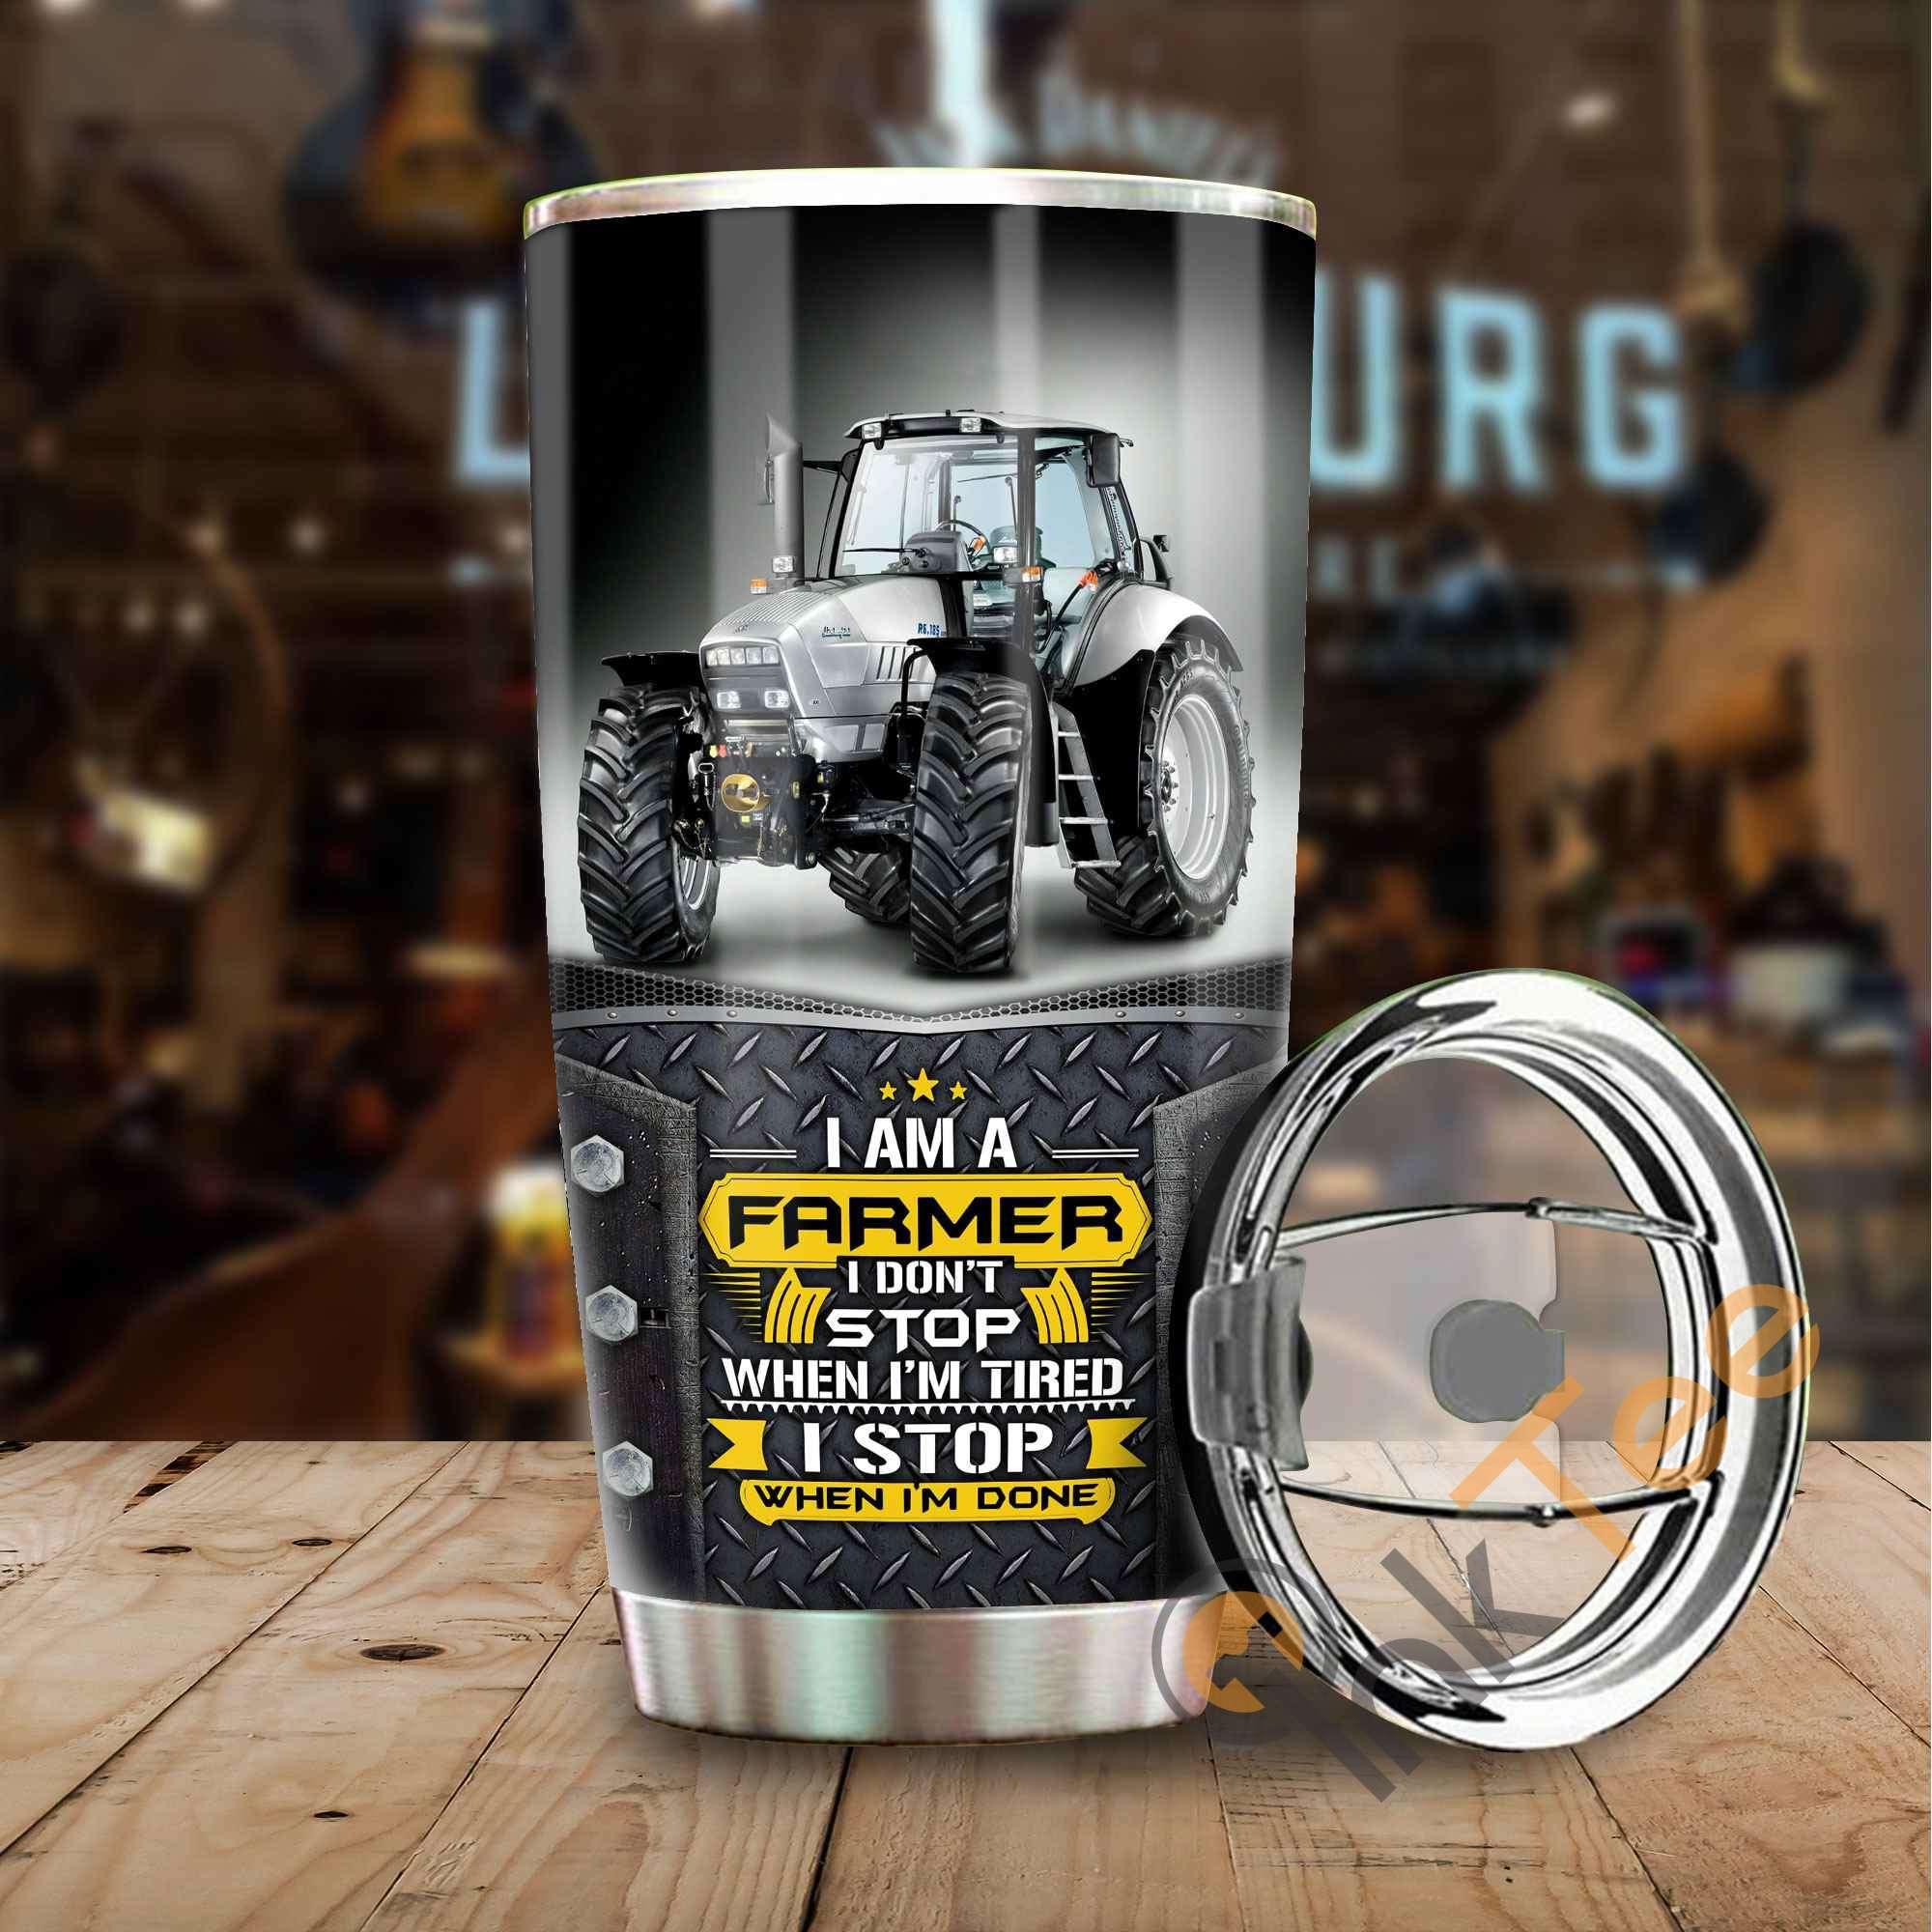 I Am A Farmer Amazon Best Seller Sku 3699 Stainless Steel Tumbler